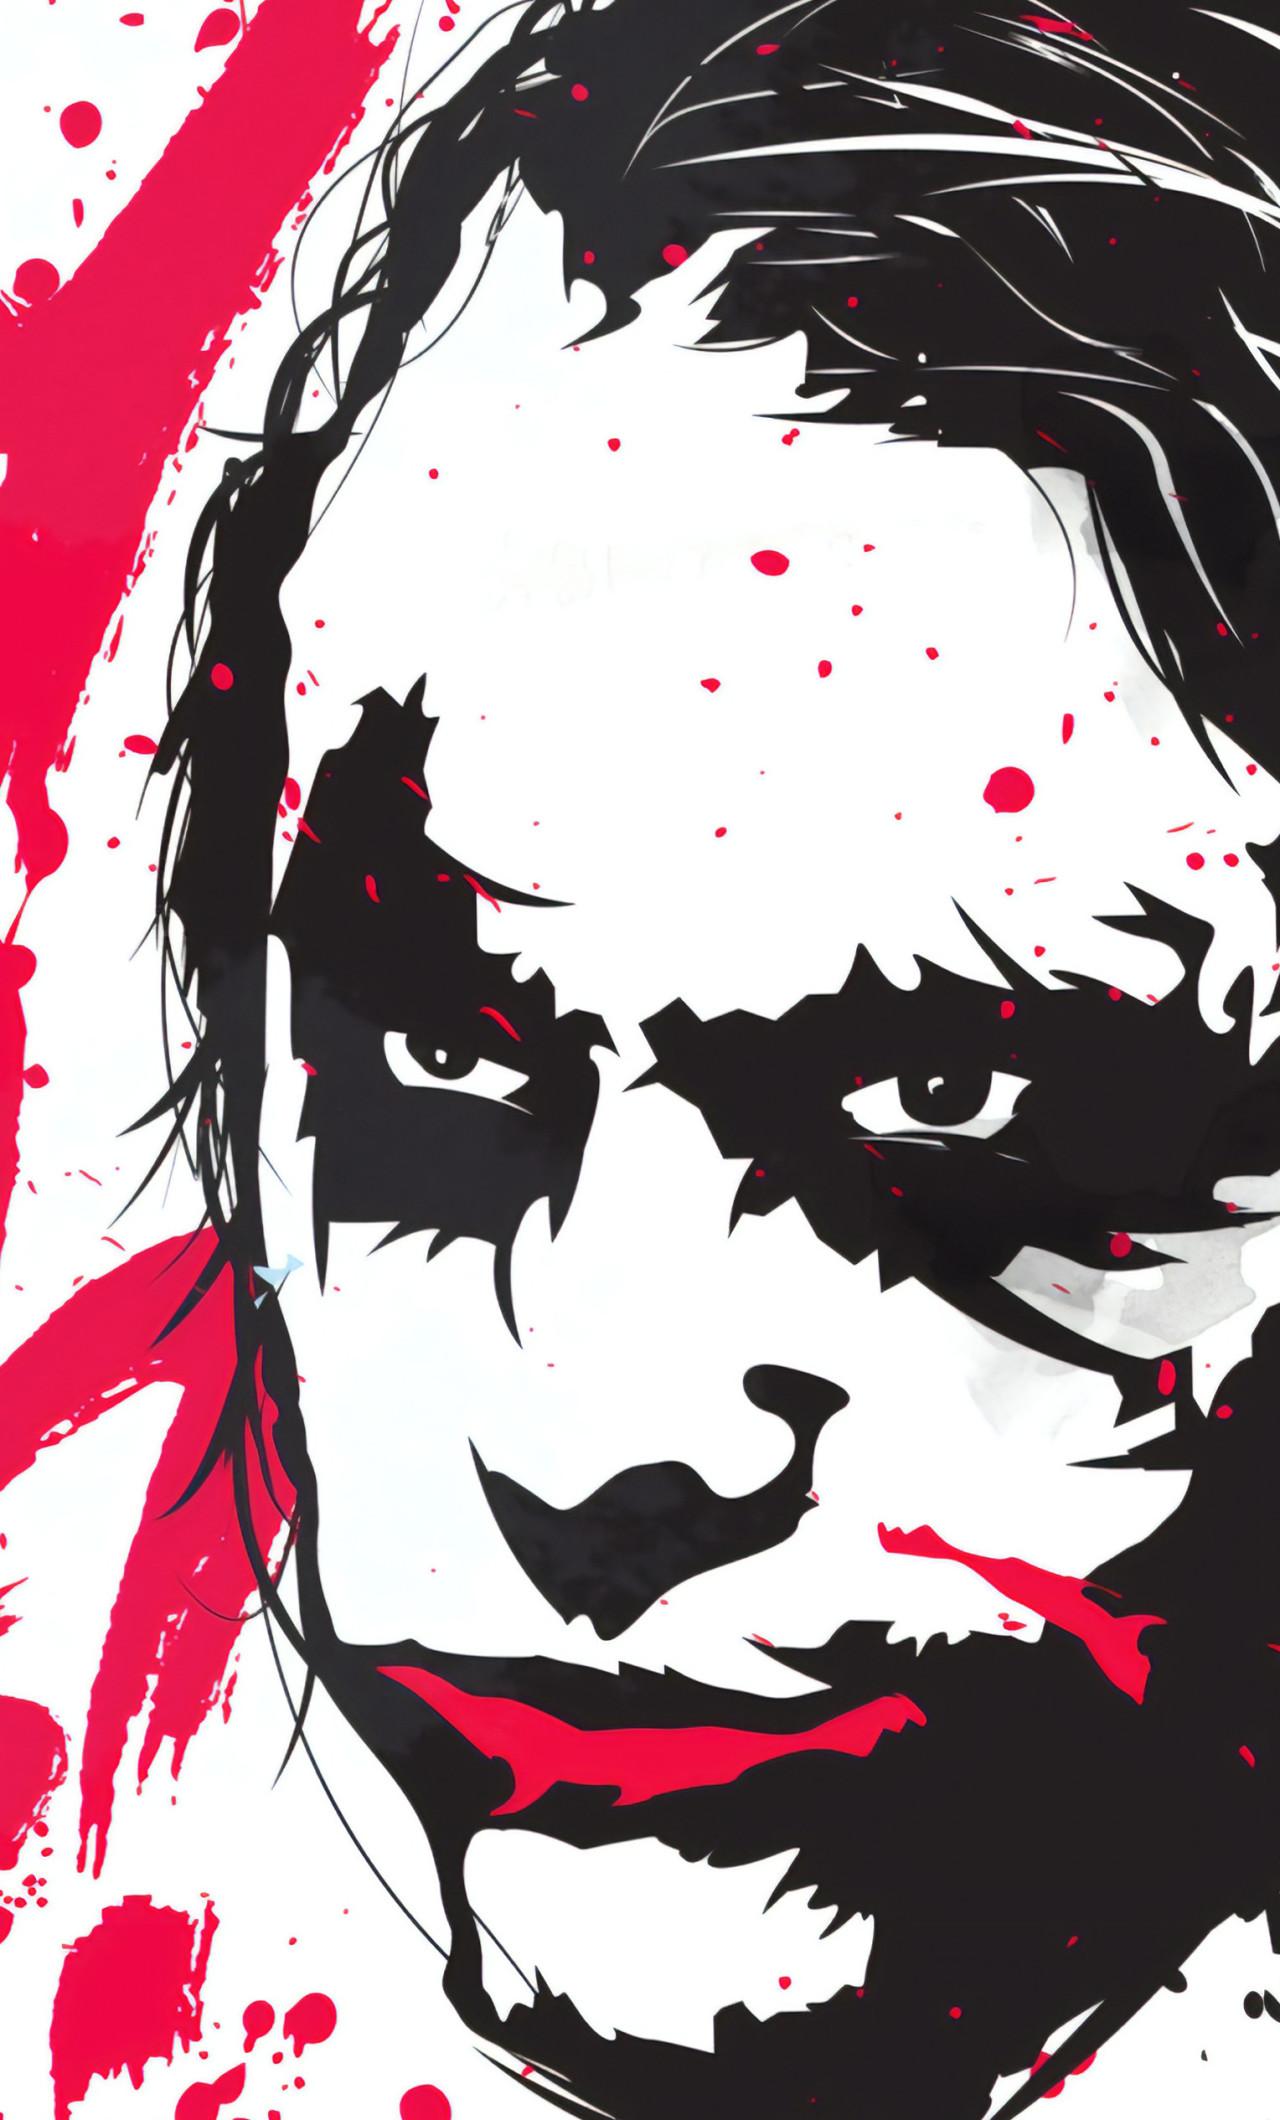 Joker Why So Serious Art - So Serious Wallpaper Hd , HD Wallpaper & Backgrounds